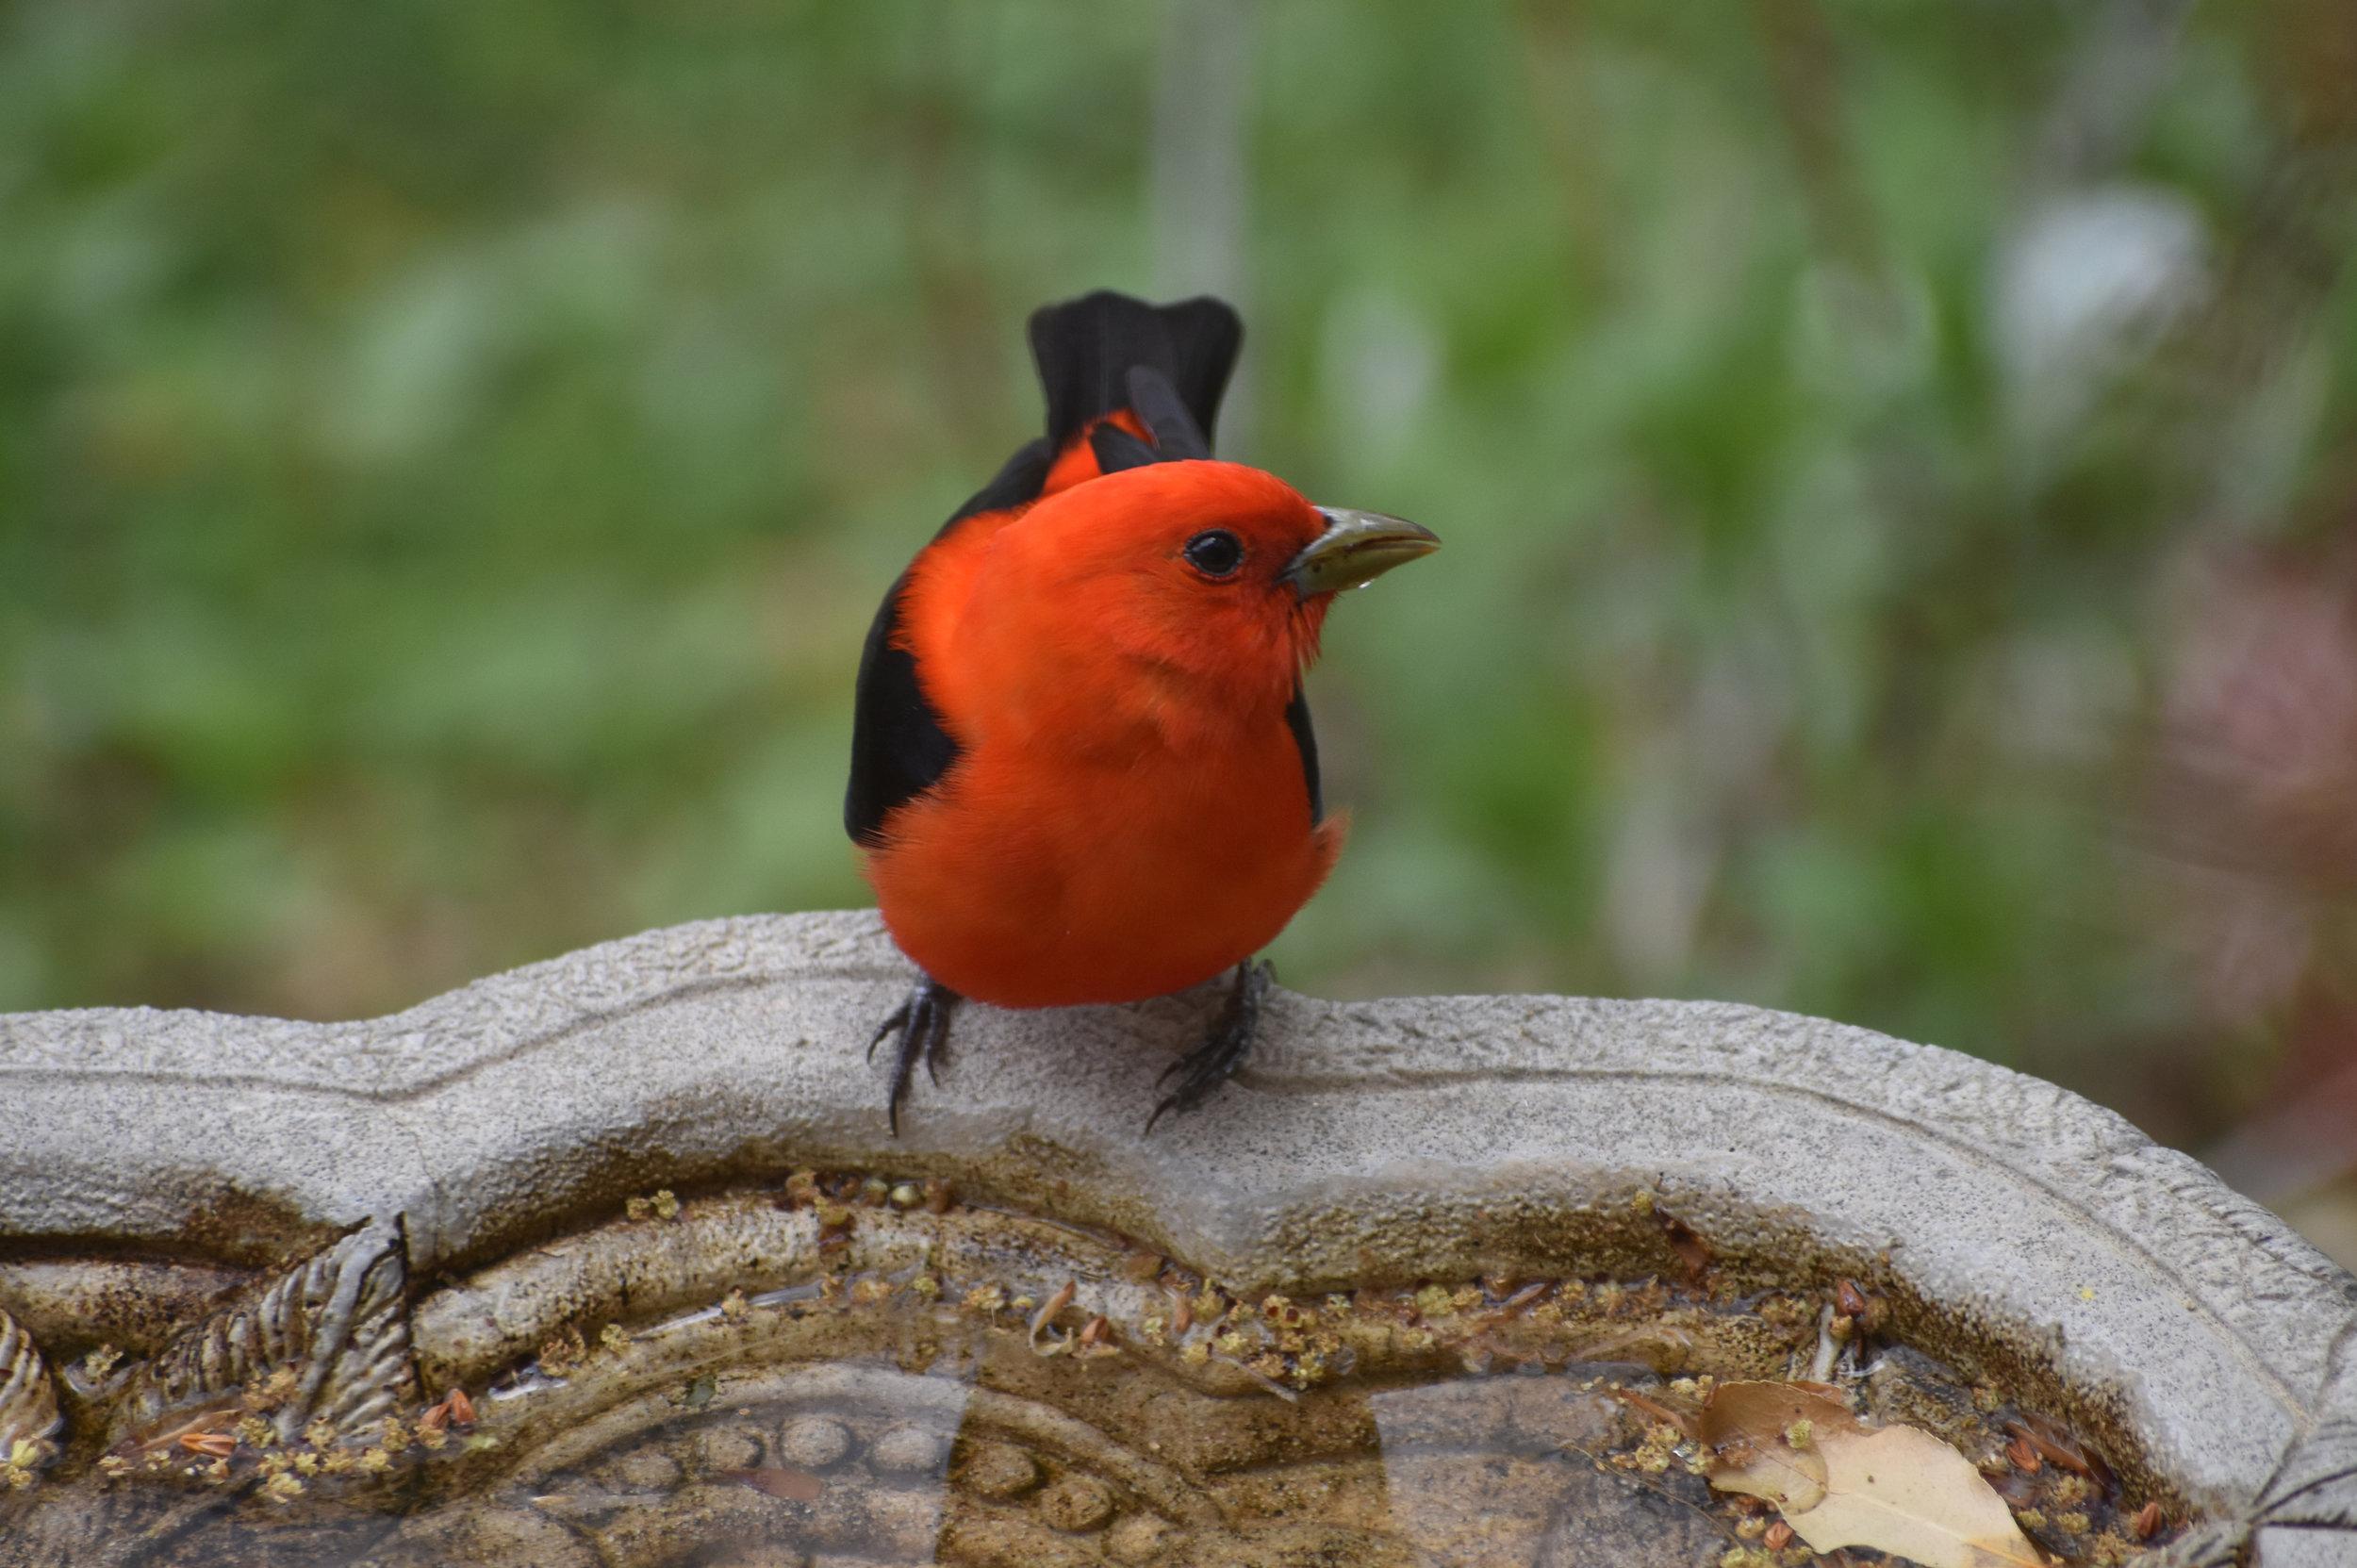 Water: Scarlet Tanager drinking from birdbath